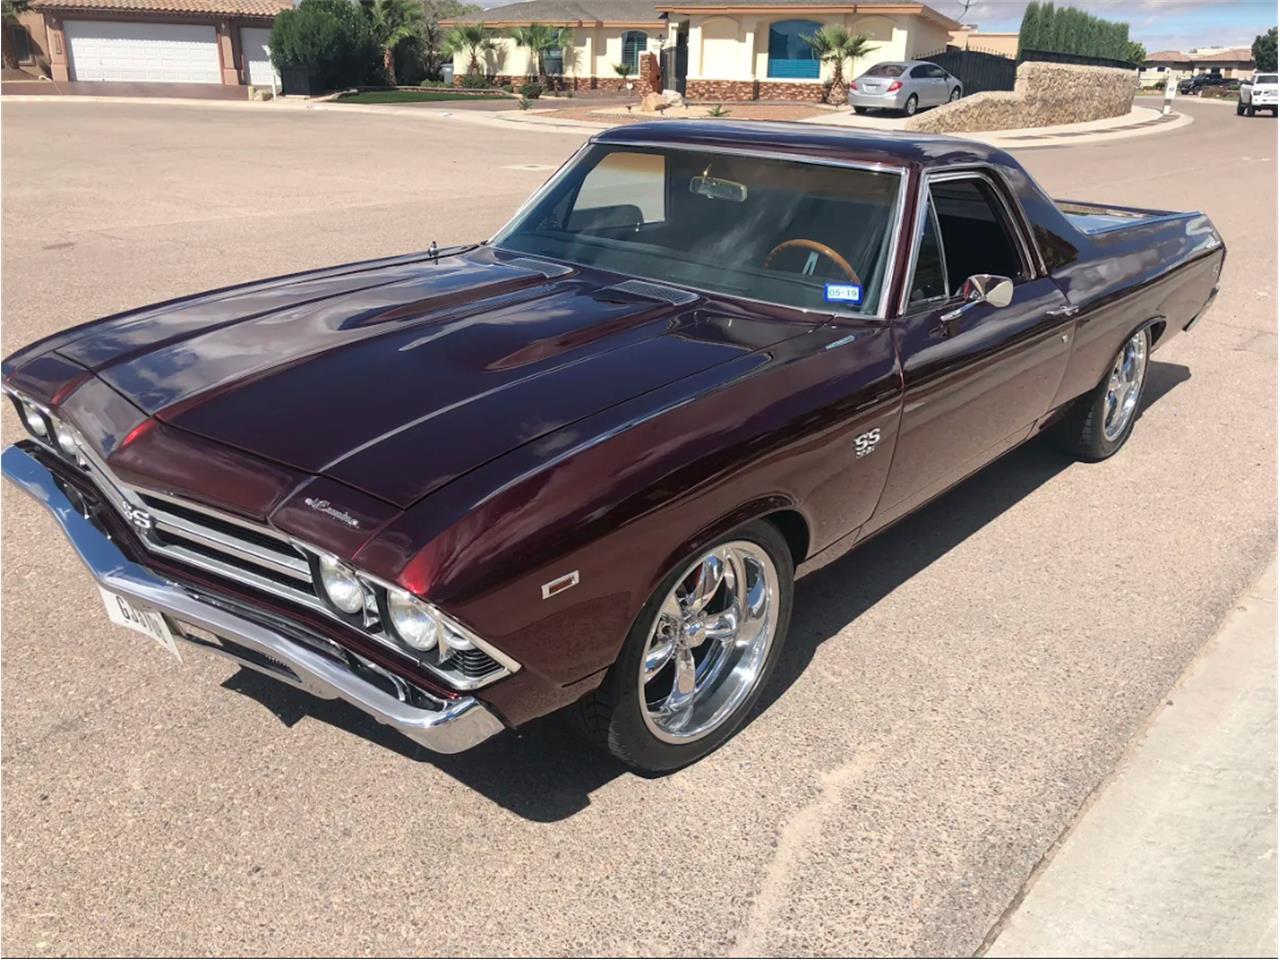 Chevrolet El Paso >> 1968 Chevrolet El Camino Ss For Sale Classiccars Com Cc